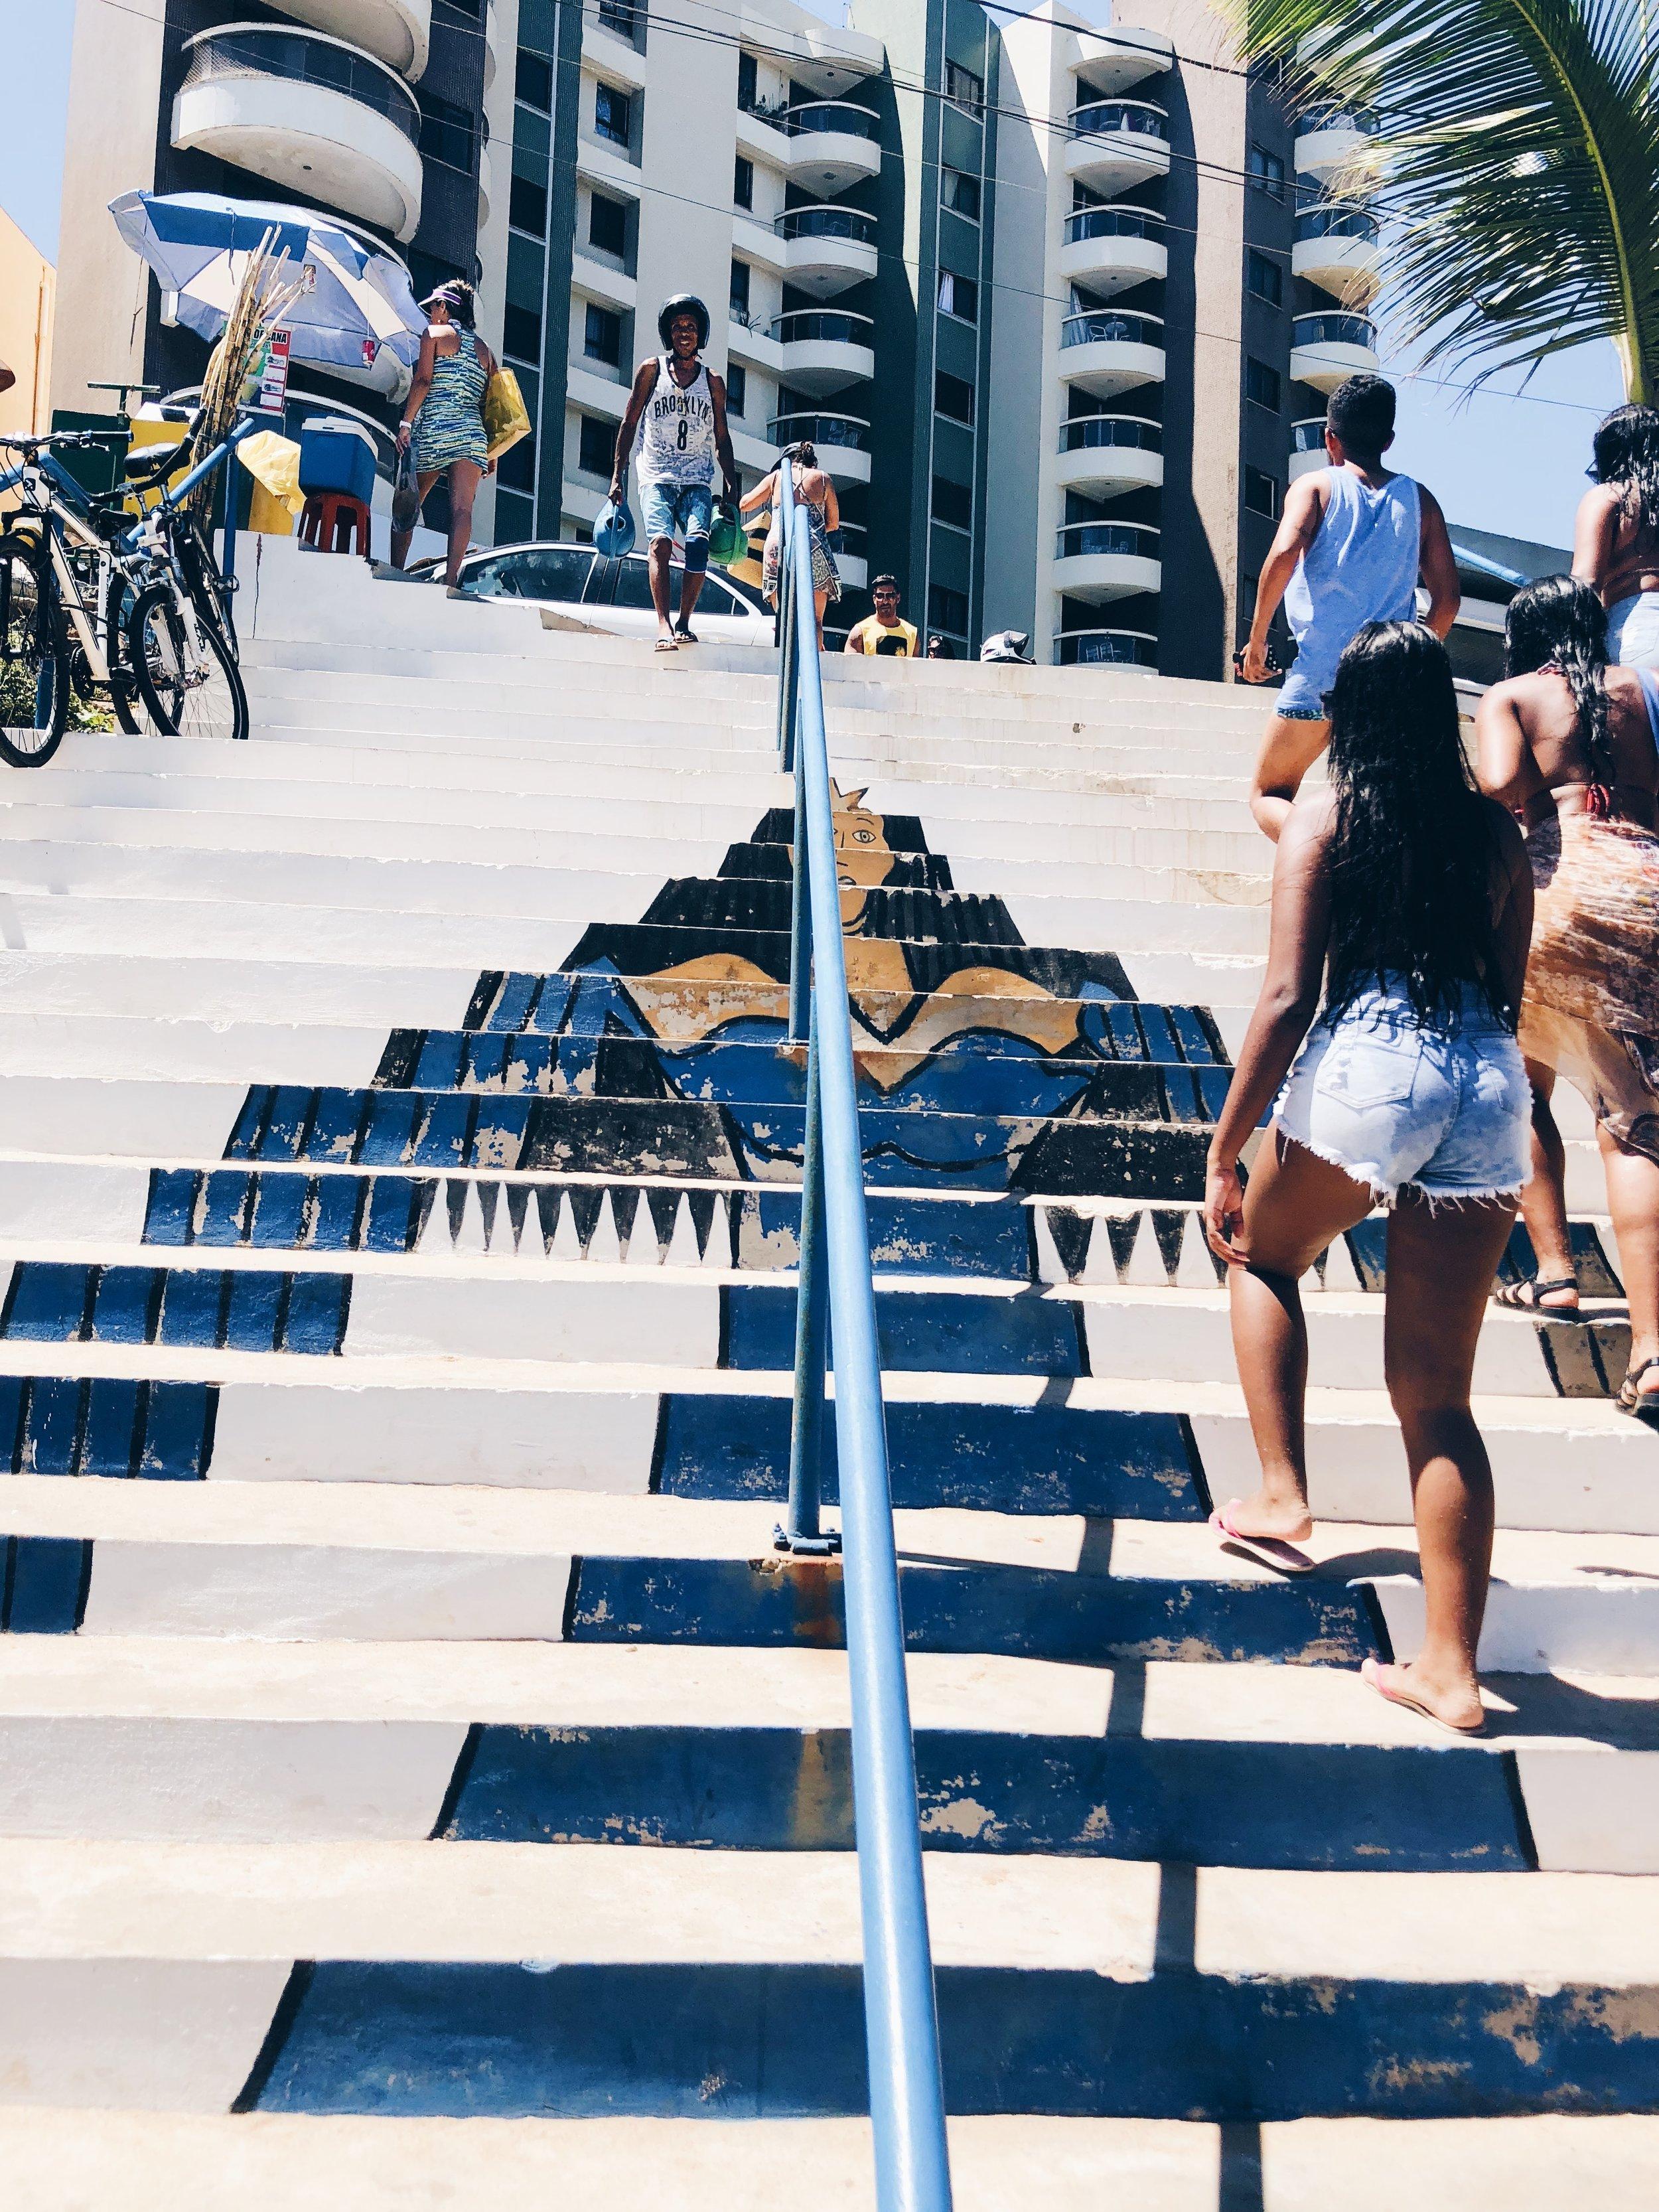 Staircase featuring Yemanjá/ Iemanjá, Brazilian Goddess of the Sea. Yemanjá is an orixa with Yoruba roots.